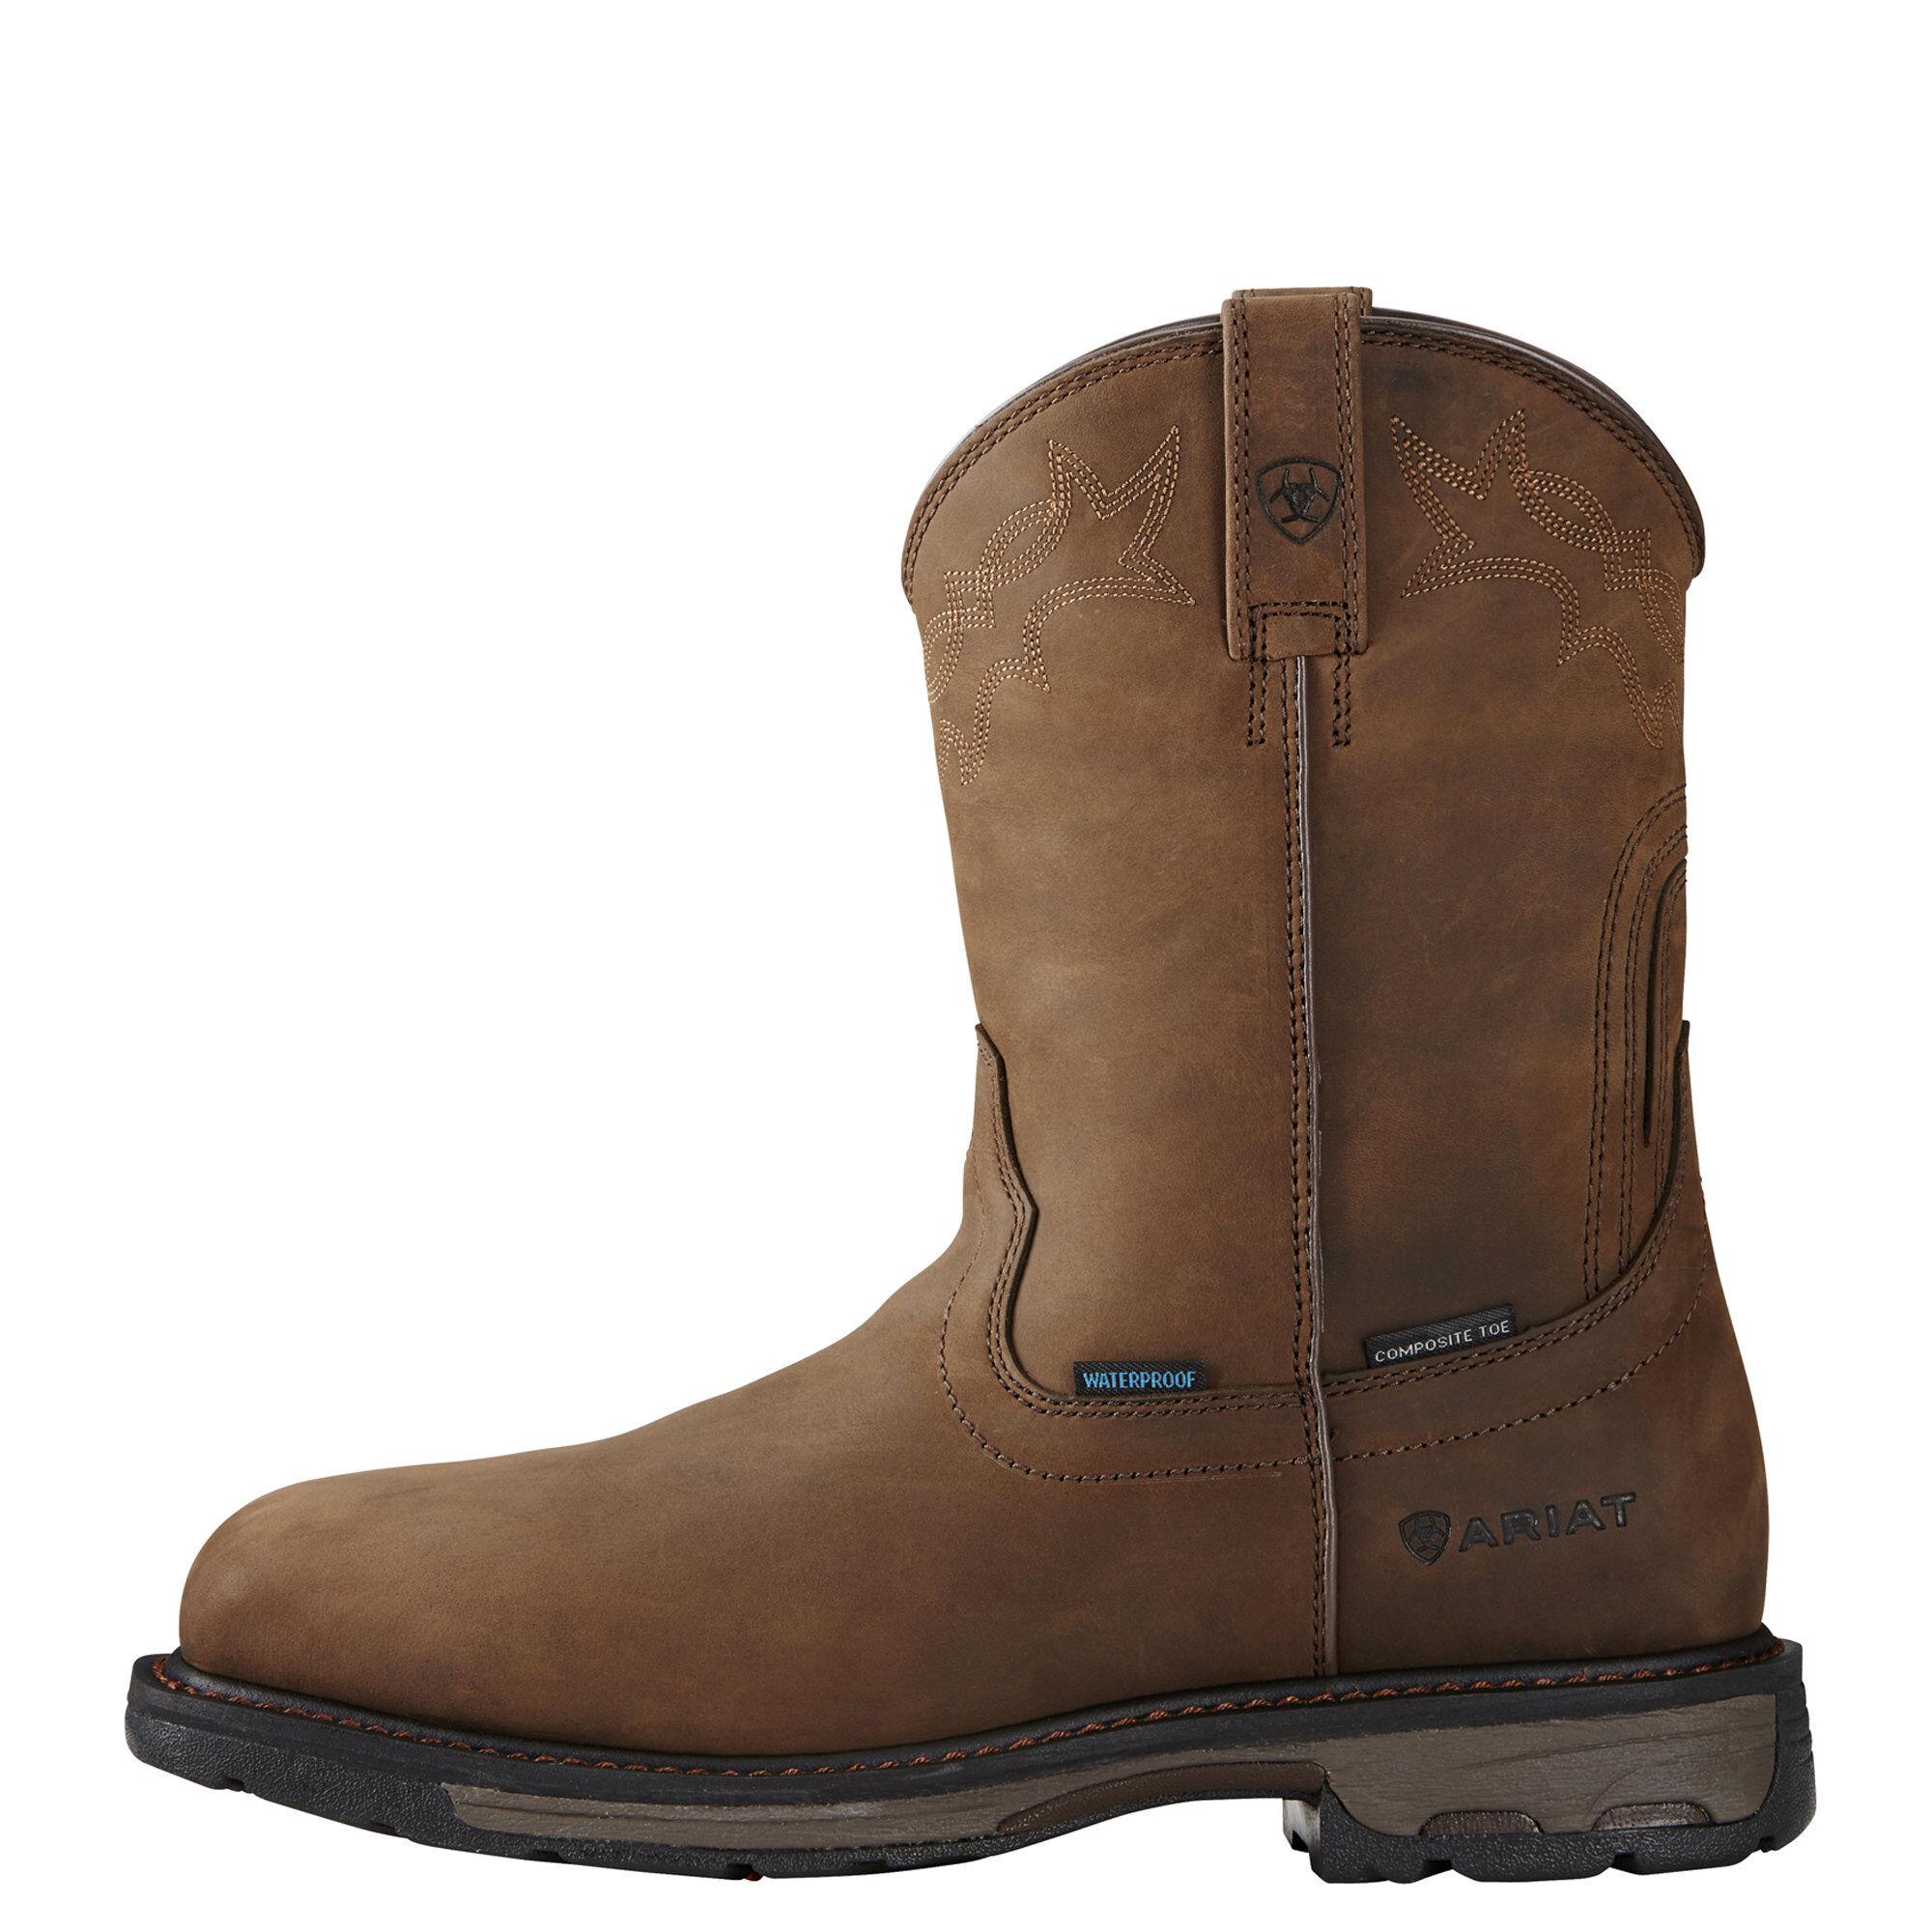 d923b032cdb are ariat work boots waterproof